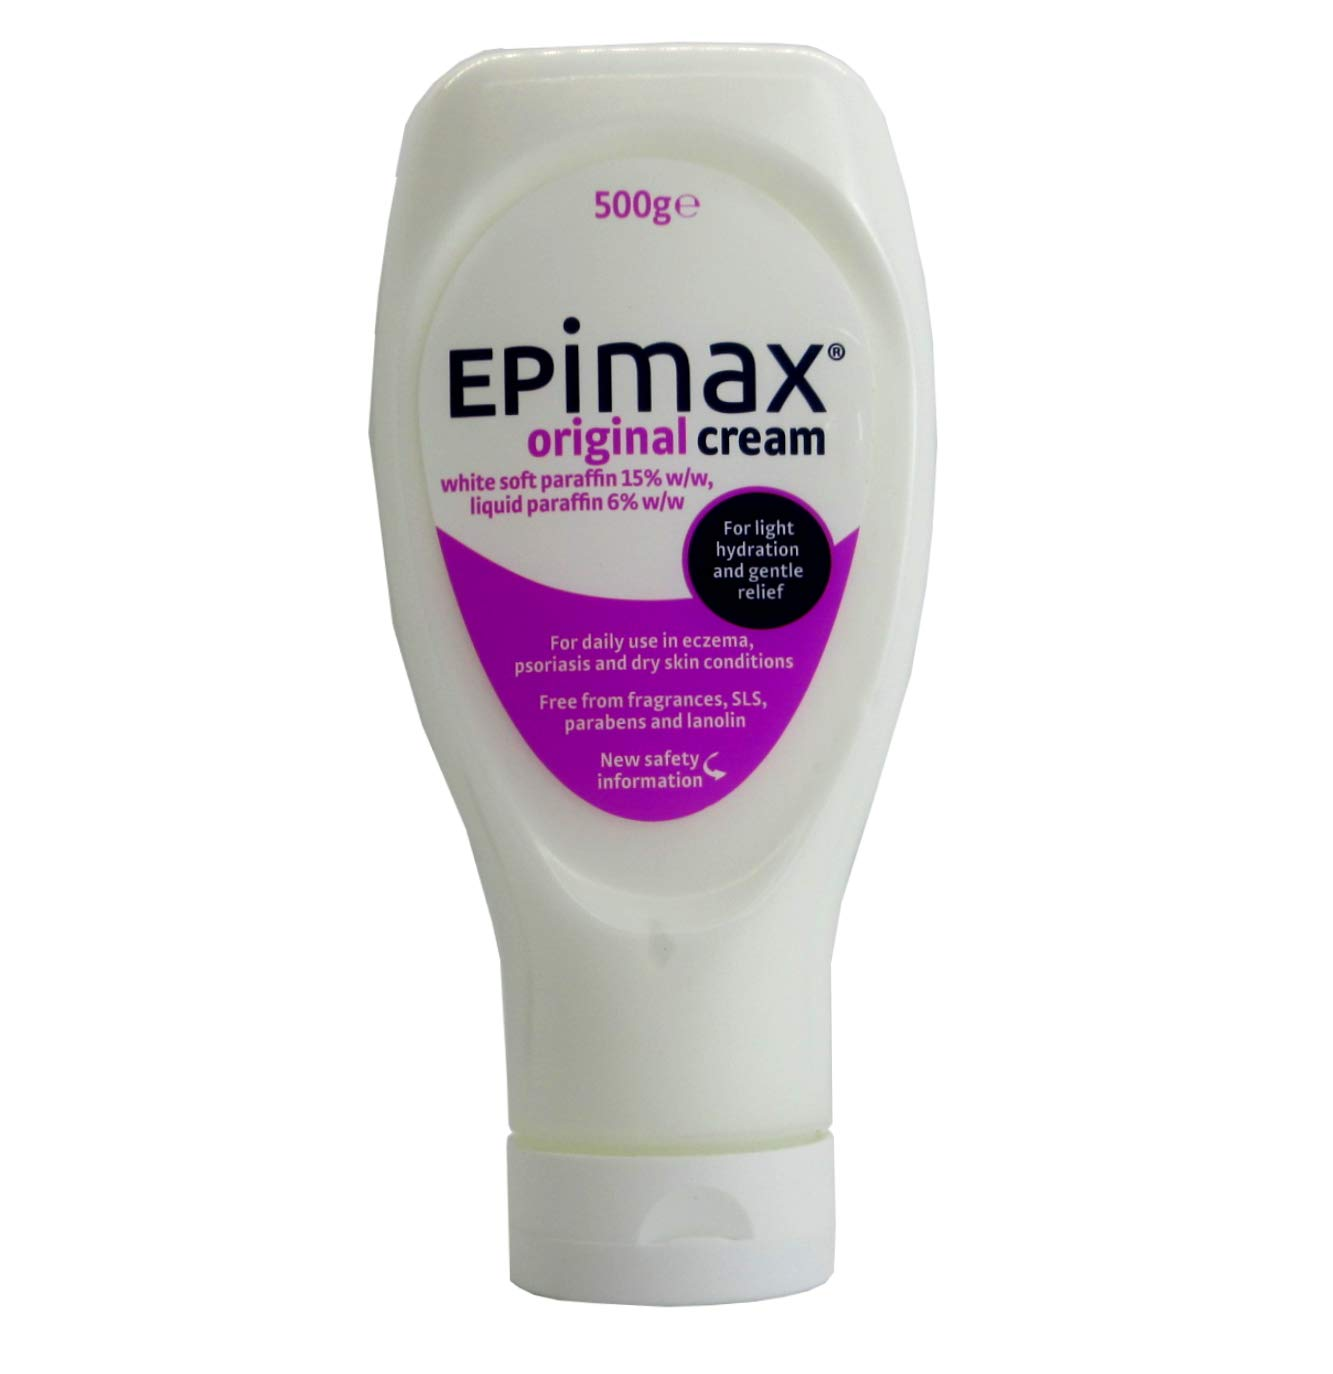 Epimax cream CHOOSE SIZE for eczema/psoriasis (500g)